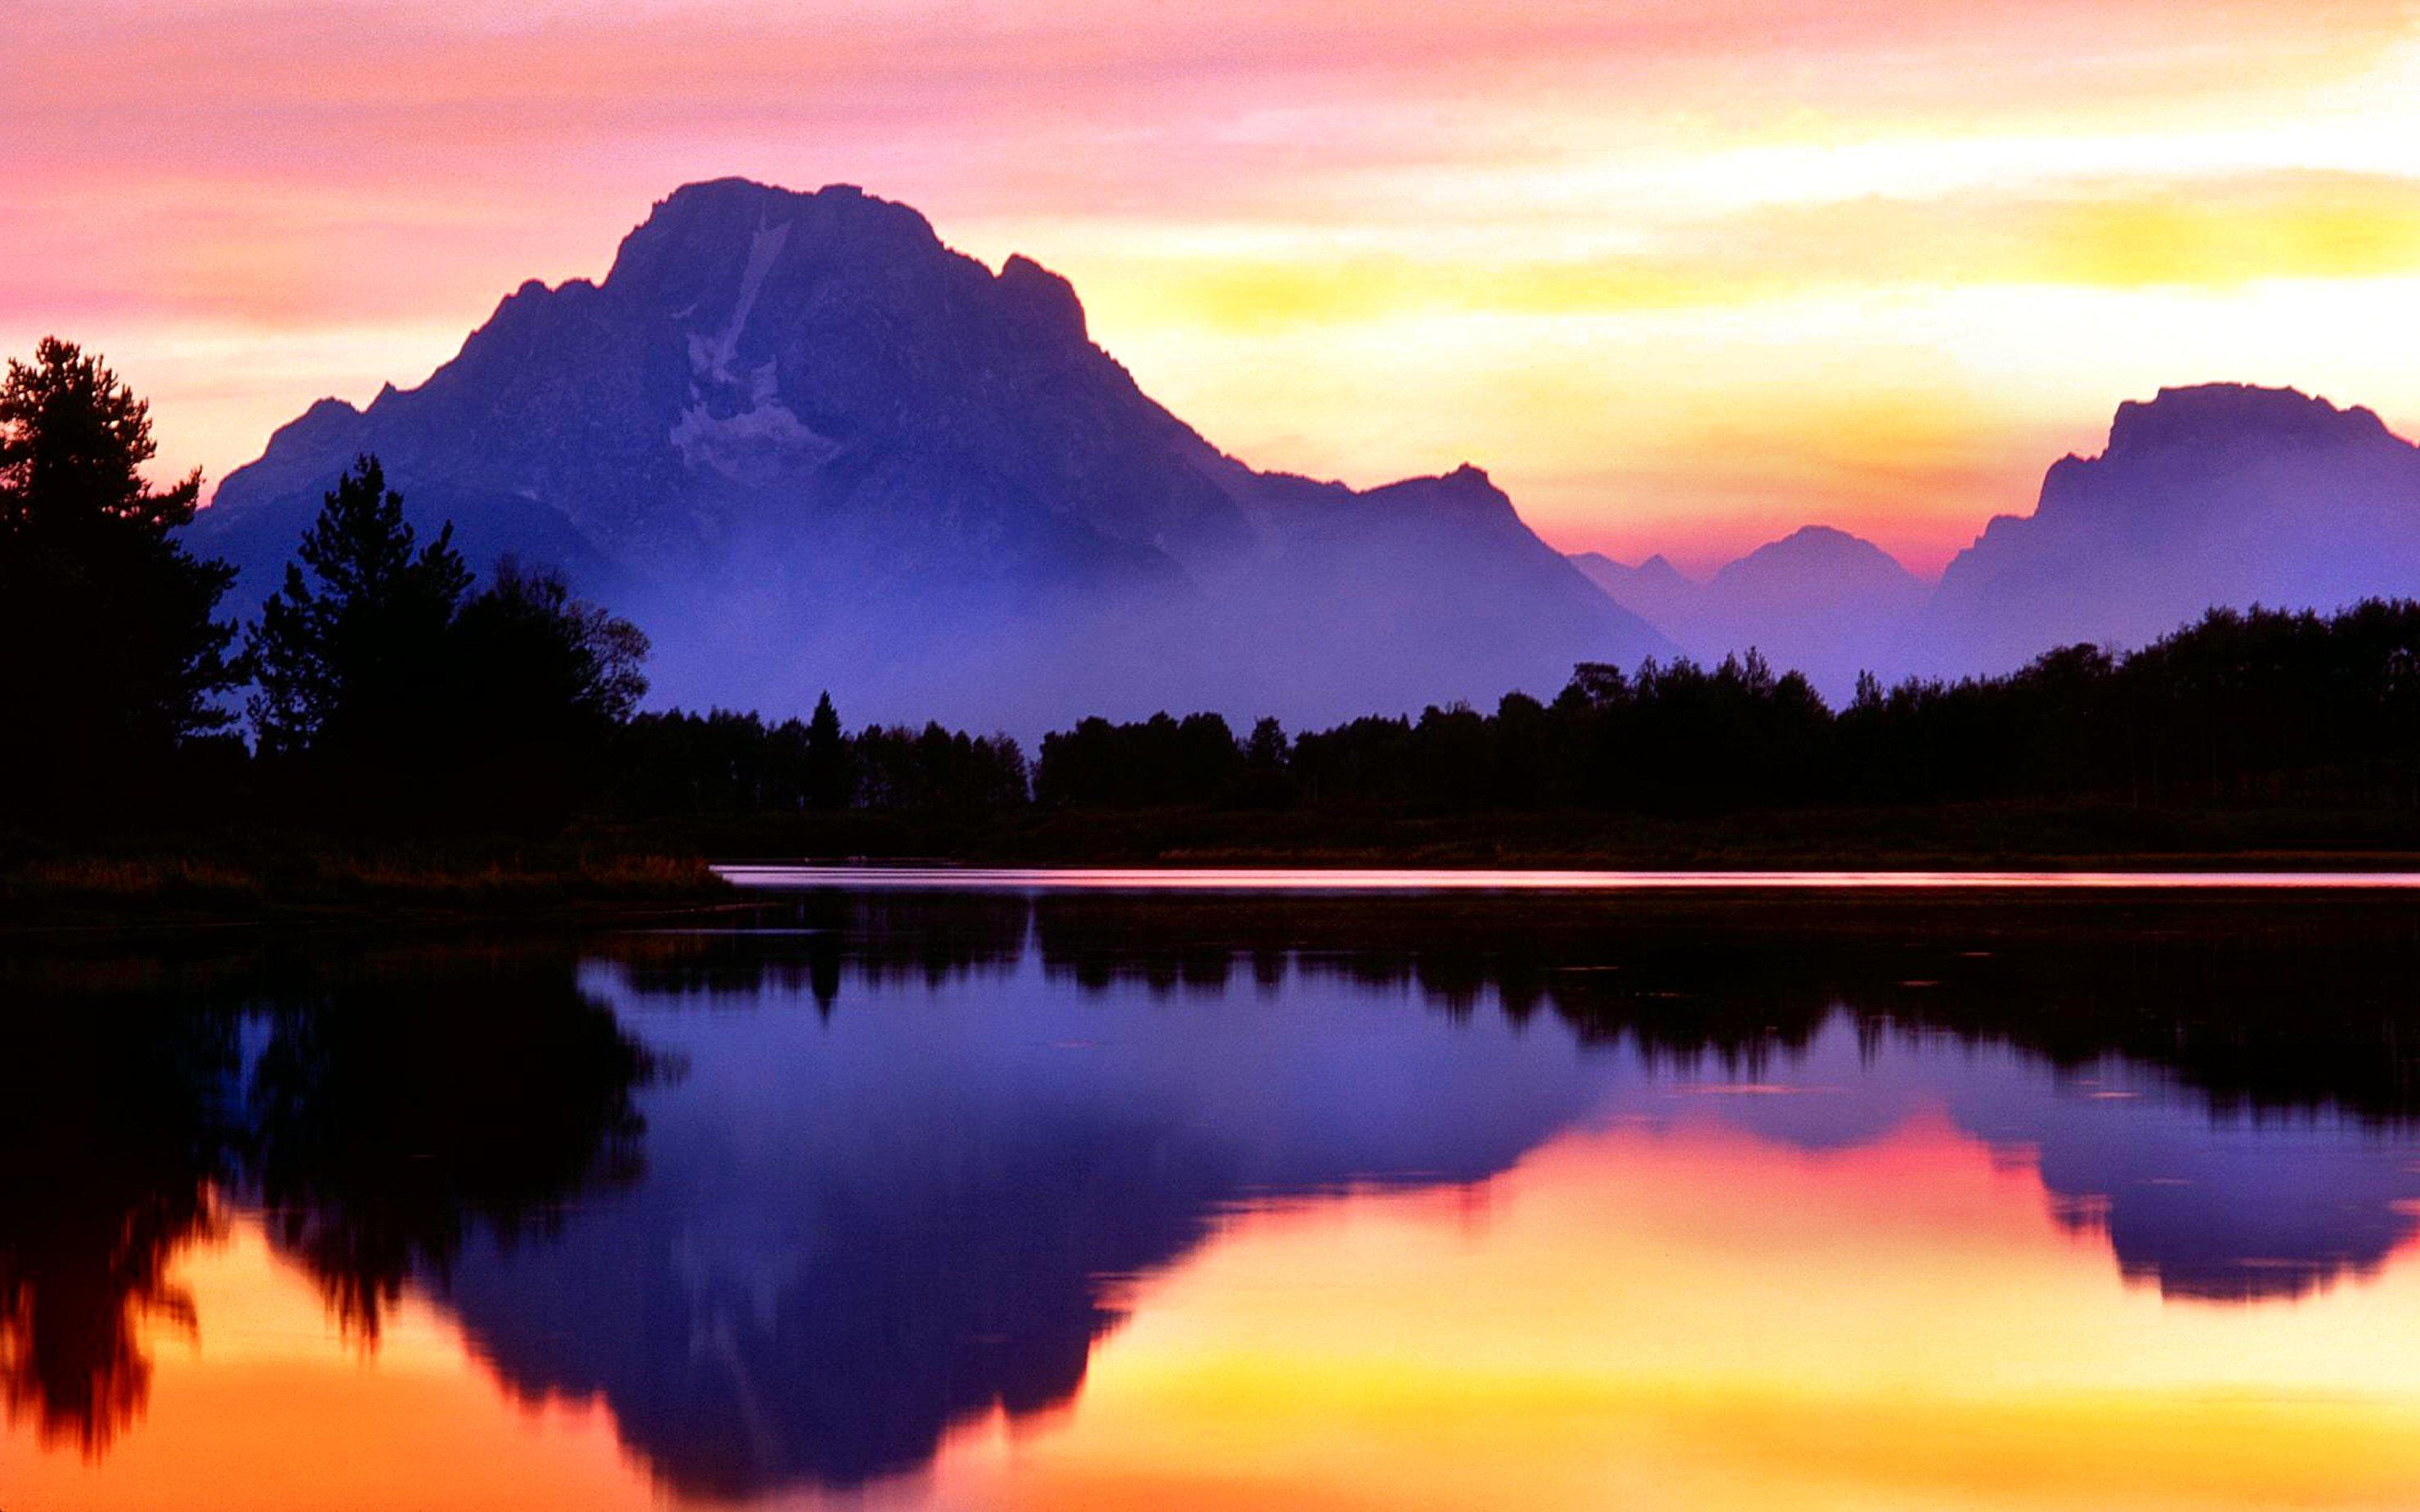 Lake Mountain Reflection Minimalism Wallpapers Hd: SCENIC [06] Mountainreflection [VersionOne200754